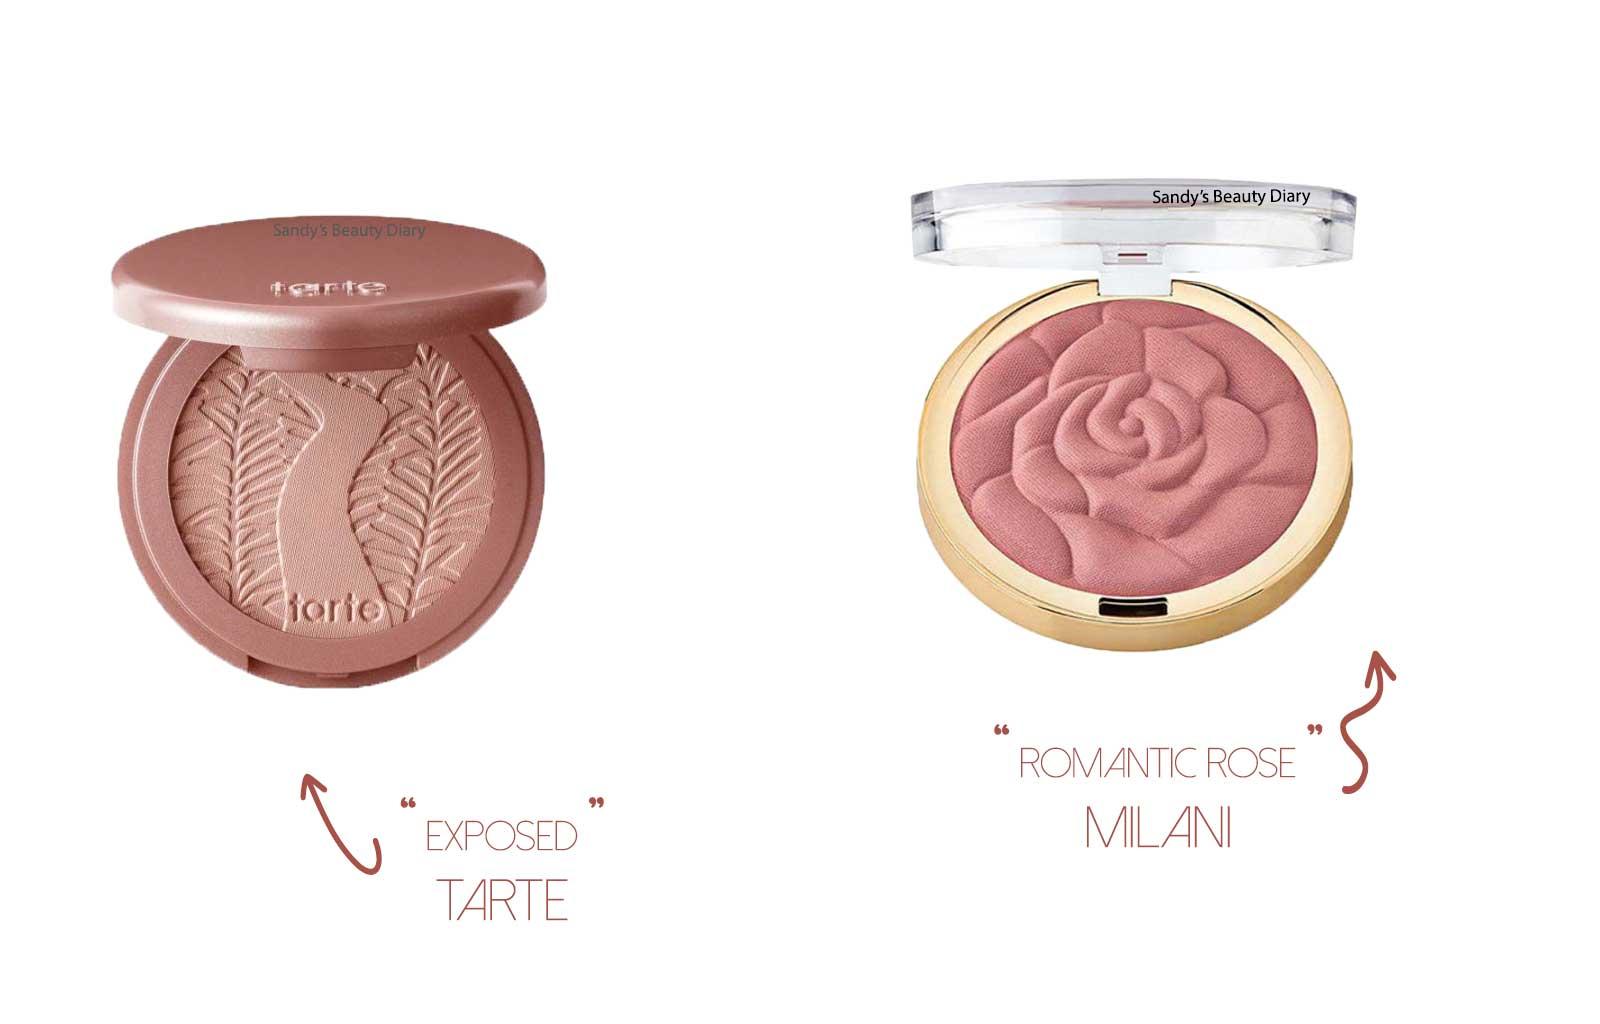 Dupes maquillage tarte blushs amazonian clay